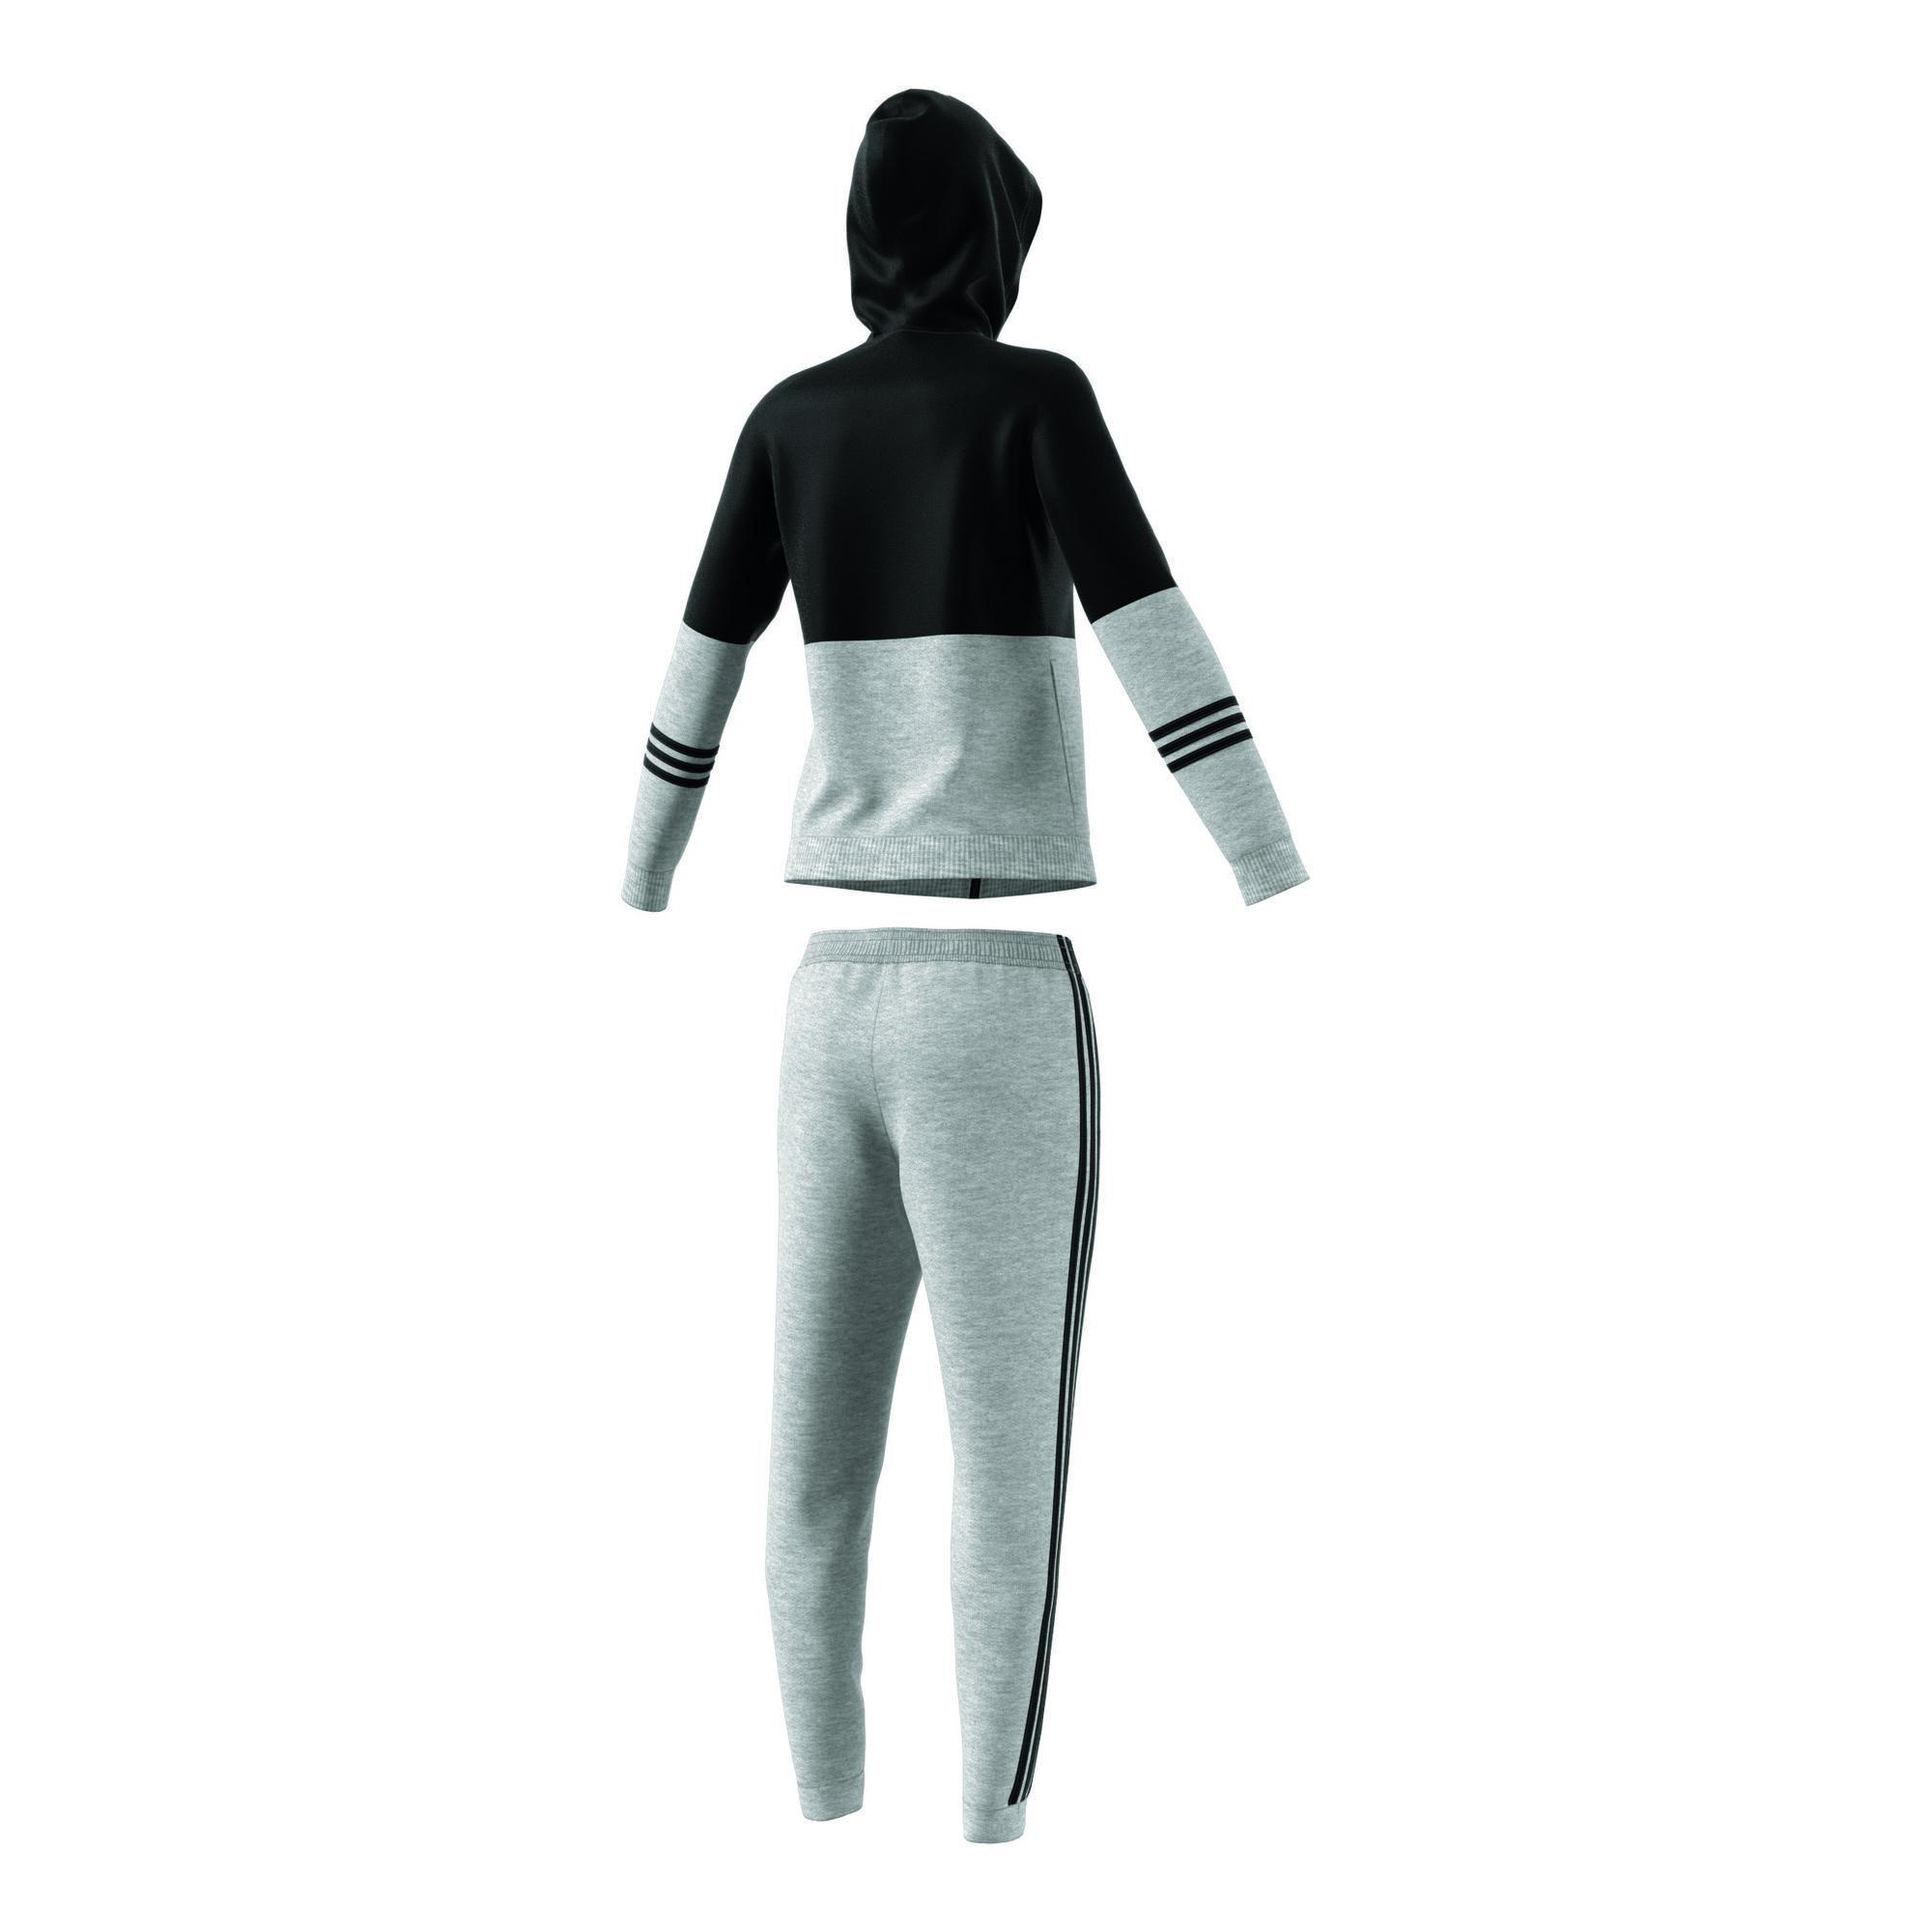 38cdd657c763 buy adidas Co Energize Tracksuit Women - Black